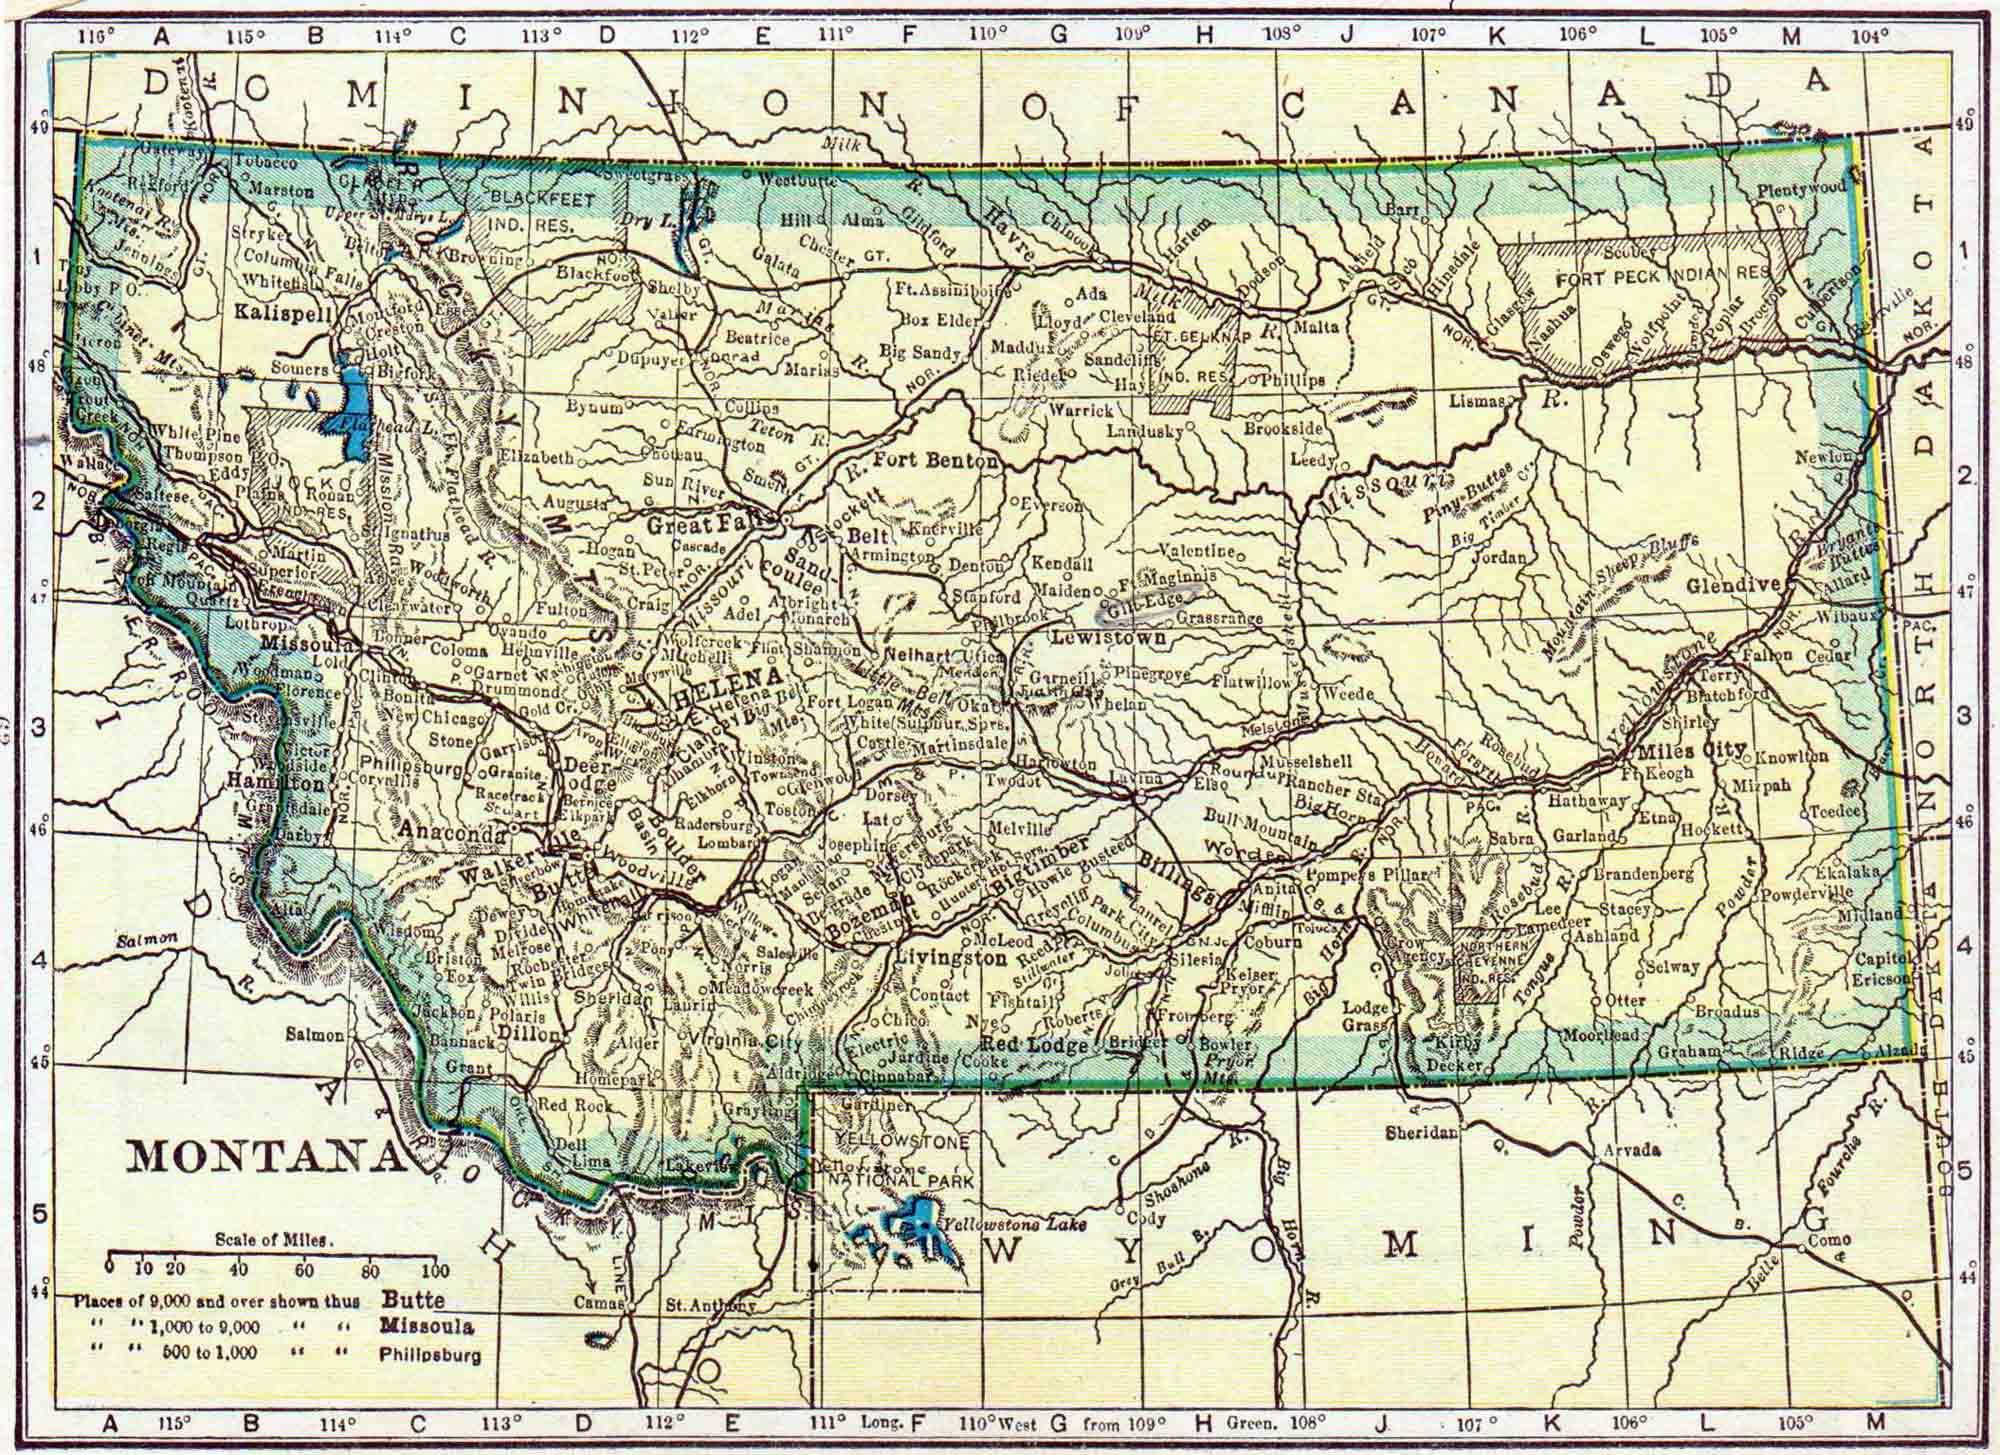 Montana Census Map Access Genealogy - Census us 1910 map